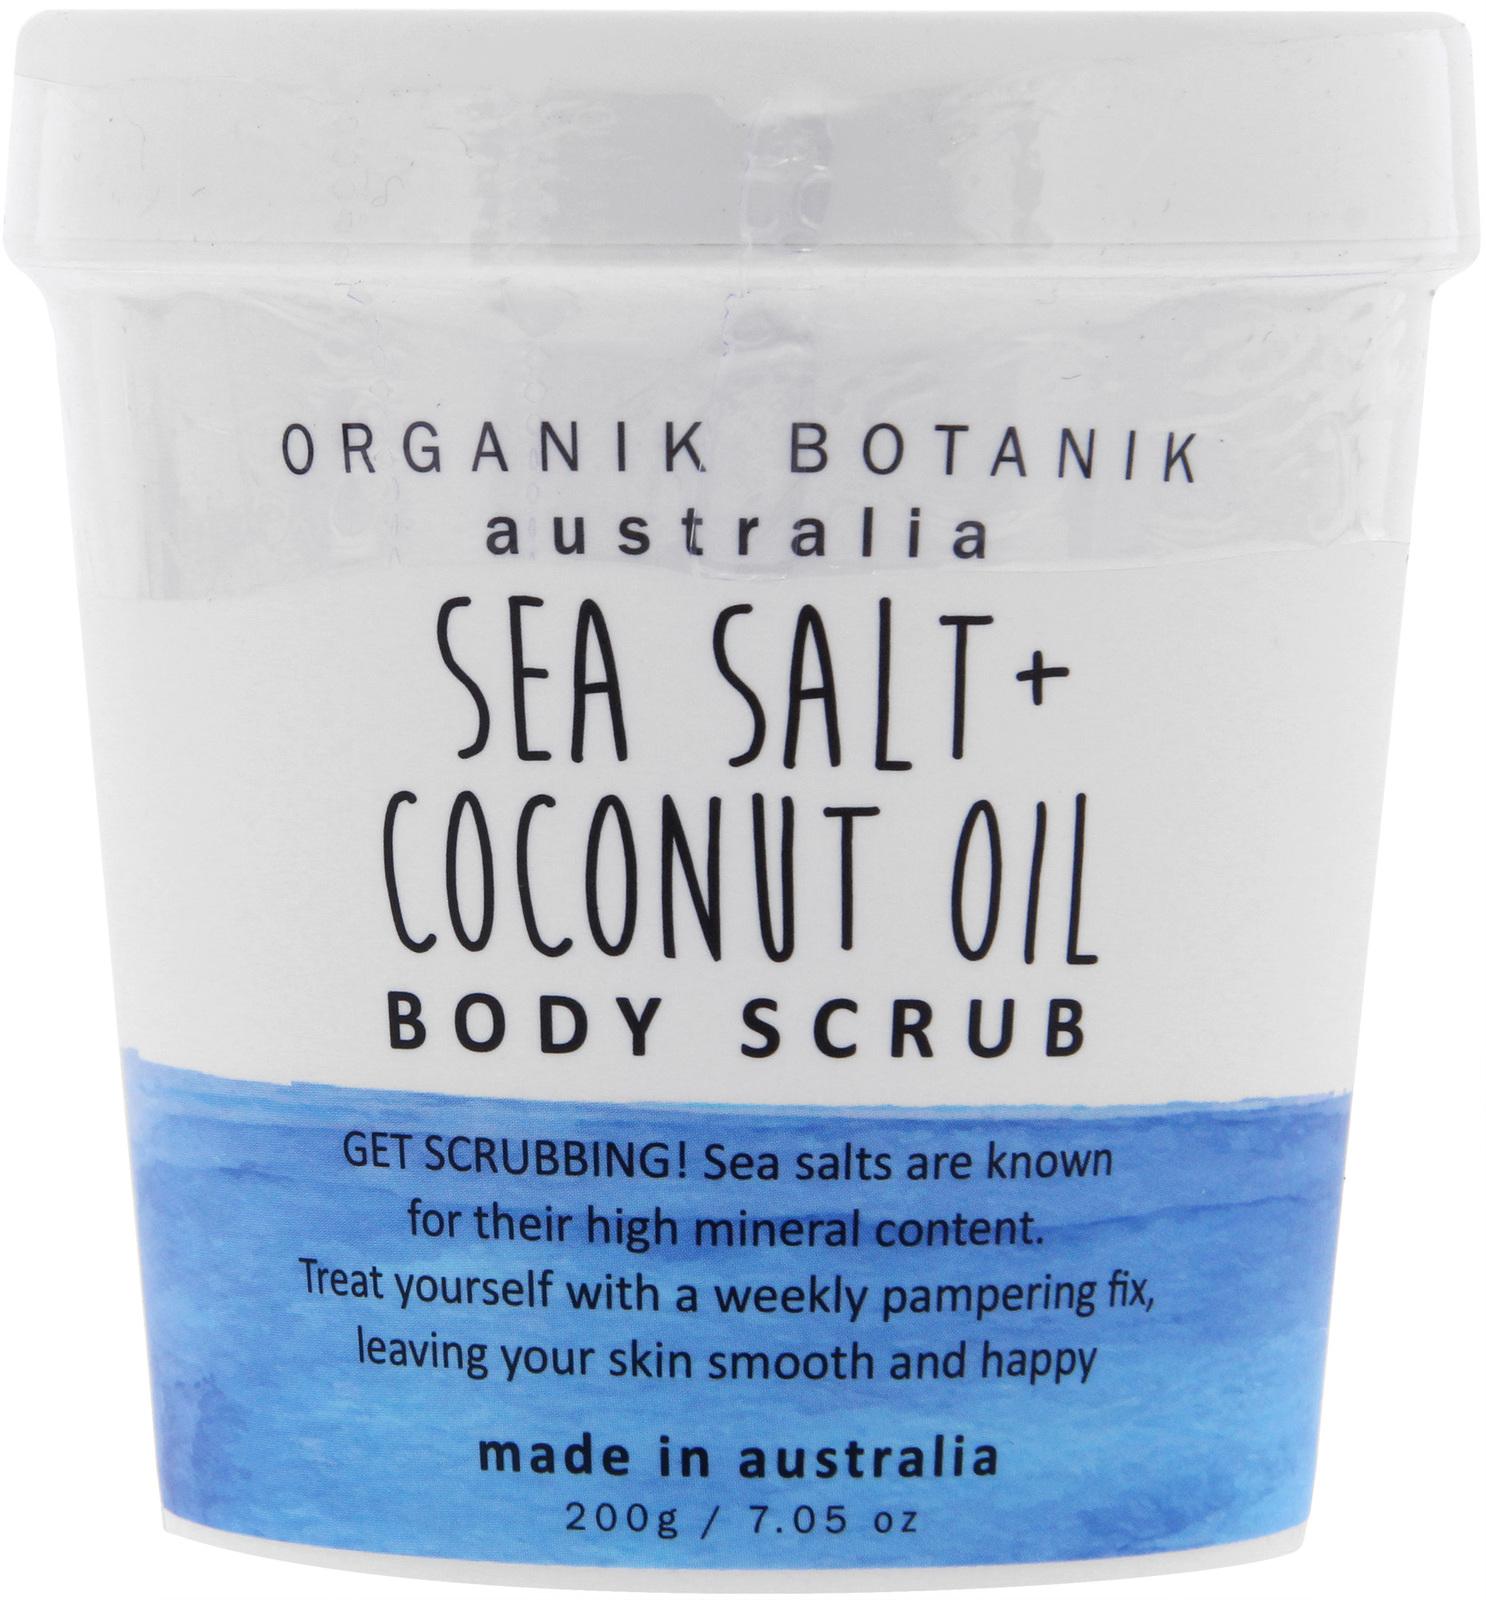 Organik Botanik Body Scrub Tub - Sea Salt & Coconut Oil (200gm) image